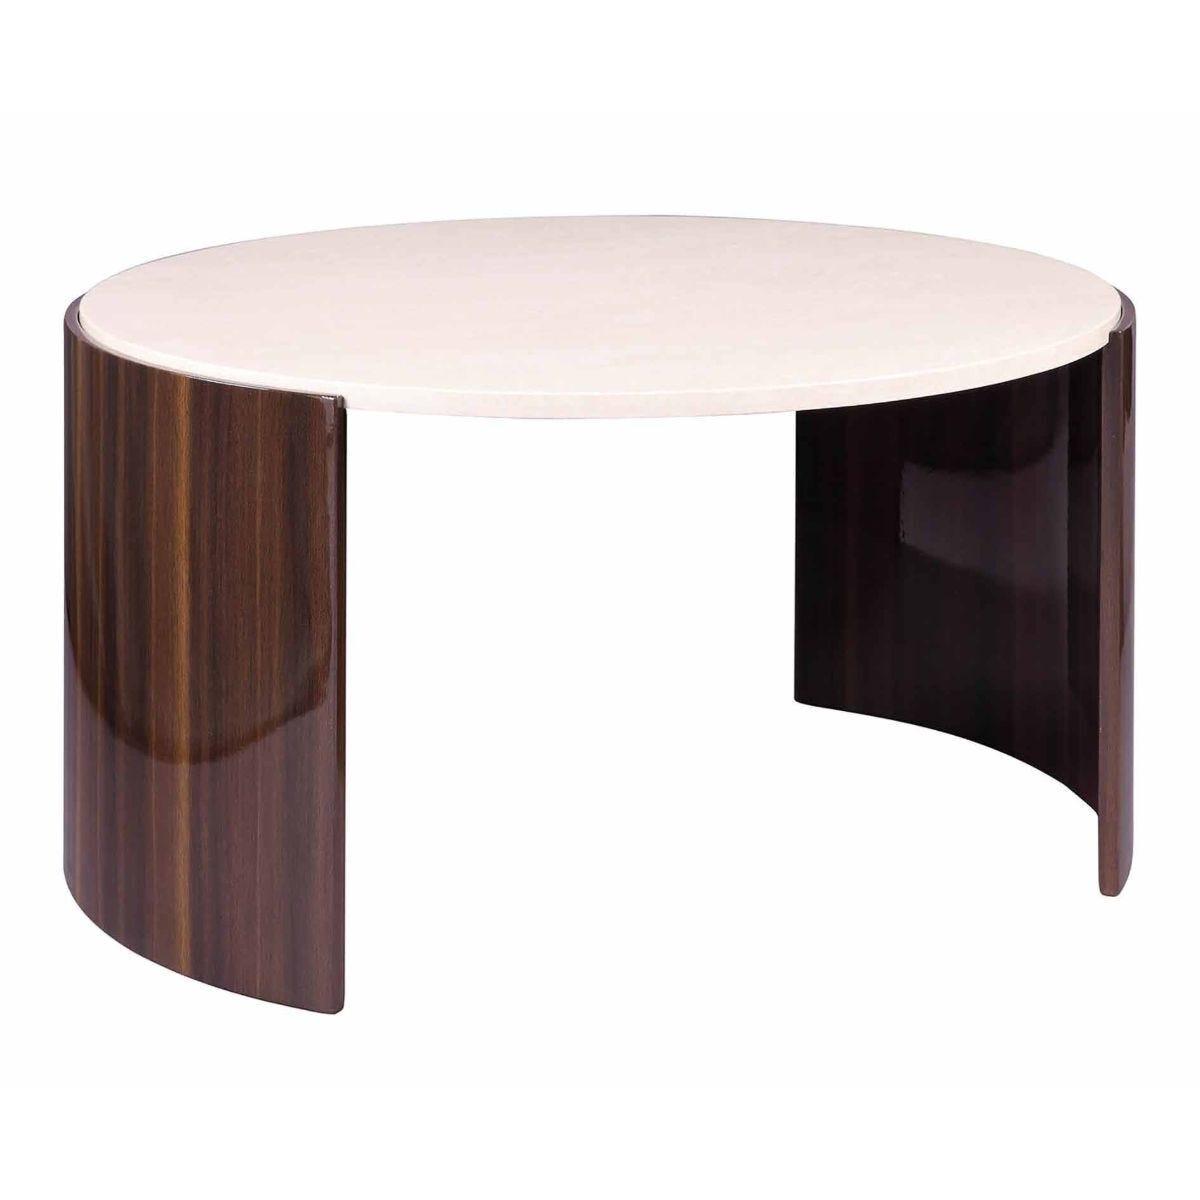 Jual Milan Polished Walnut and Cream Coffee Table